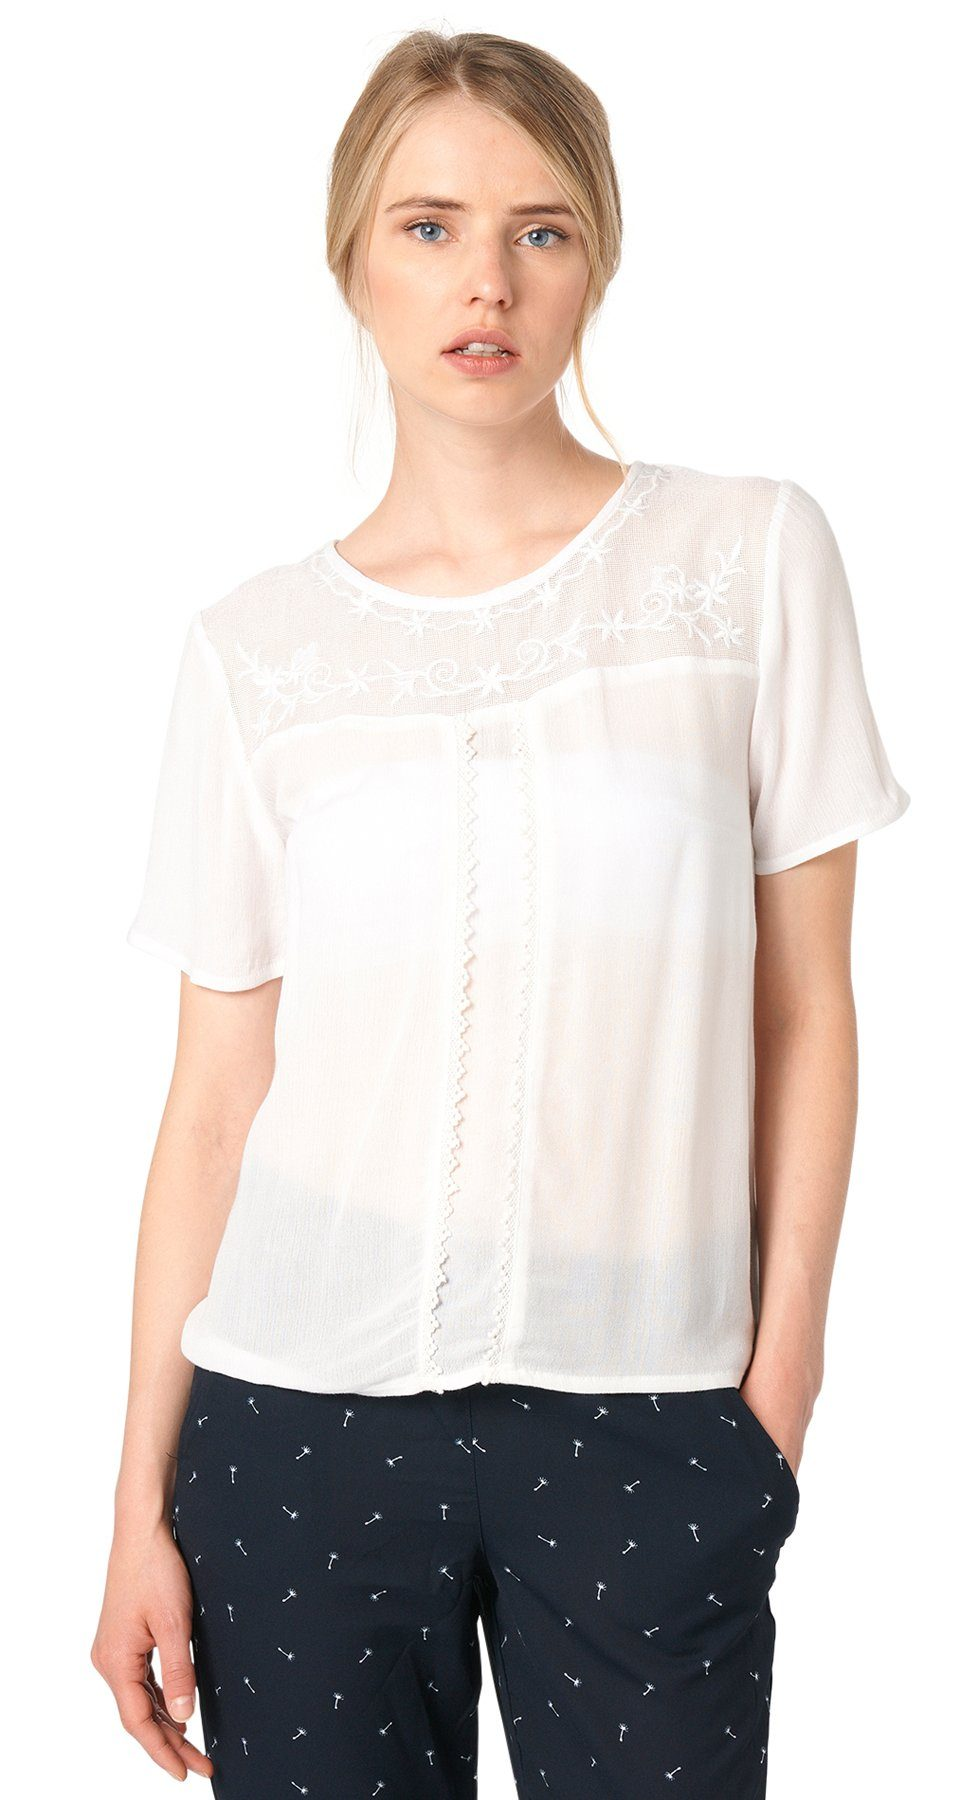 TOM TAILOR DENIM T-Shirt »feminines Shirt mit Stickerei«